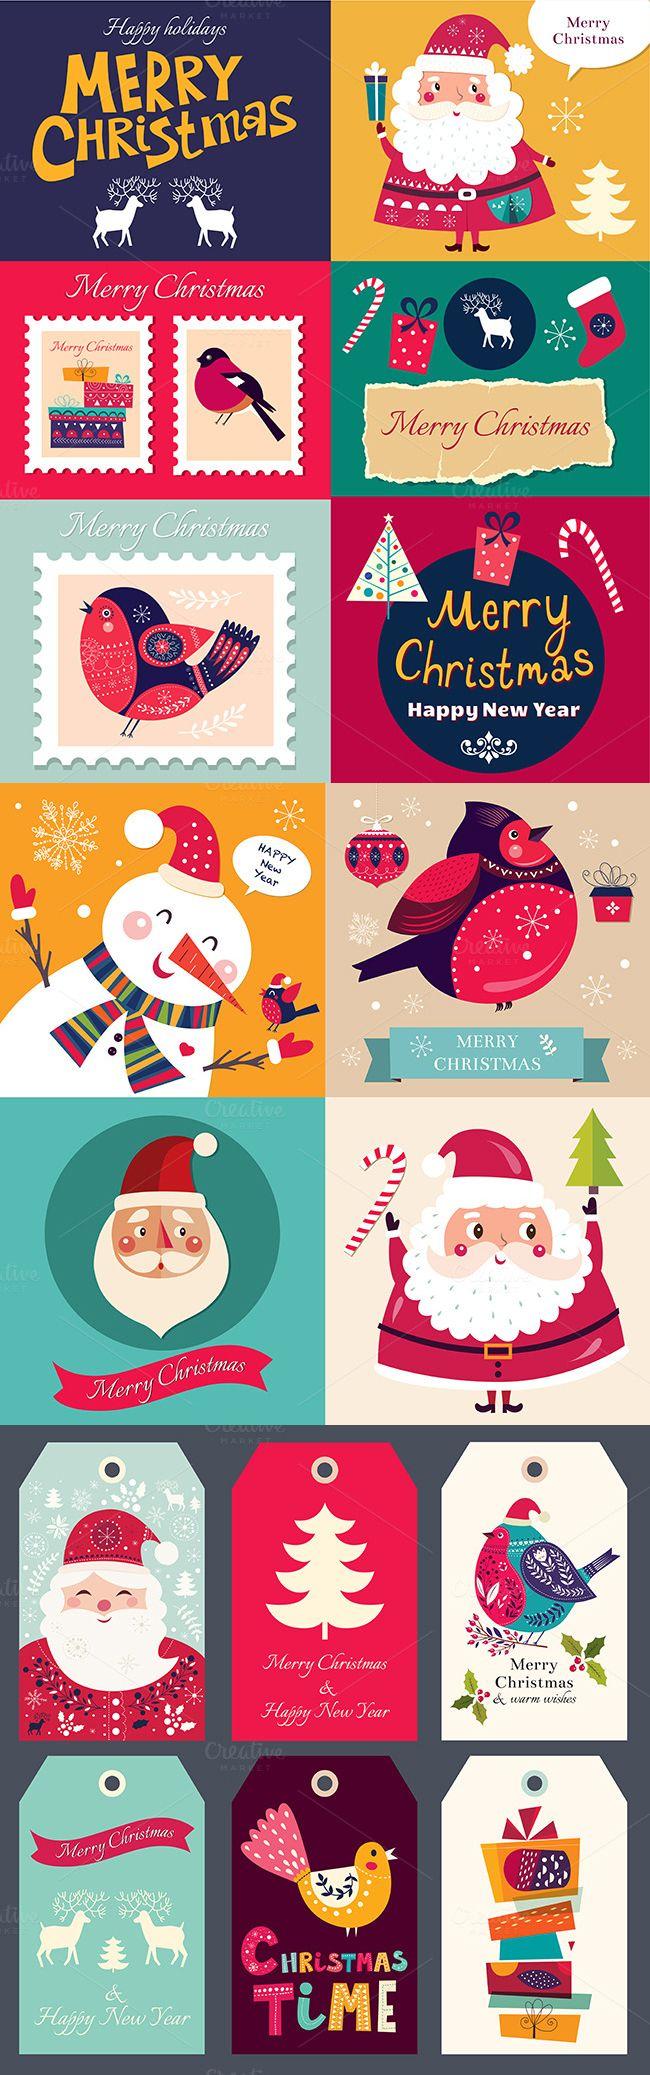 Christmas badges and cards Vector Template EPS, AI Illustrator #design Download: https://creativemarket.com/MoleskoStudio/425862-Christmas-badges-and-cards?u=ksioks